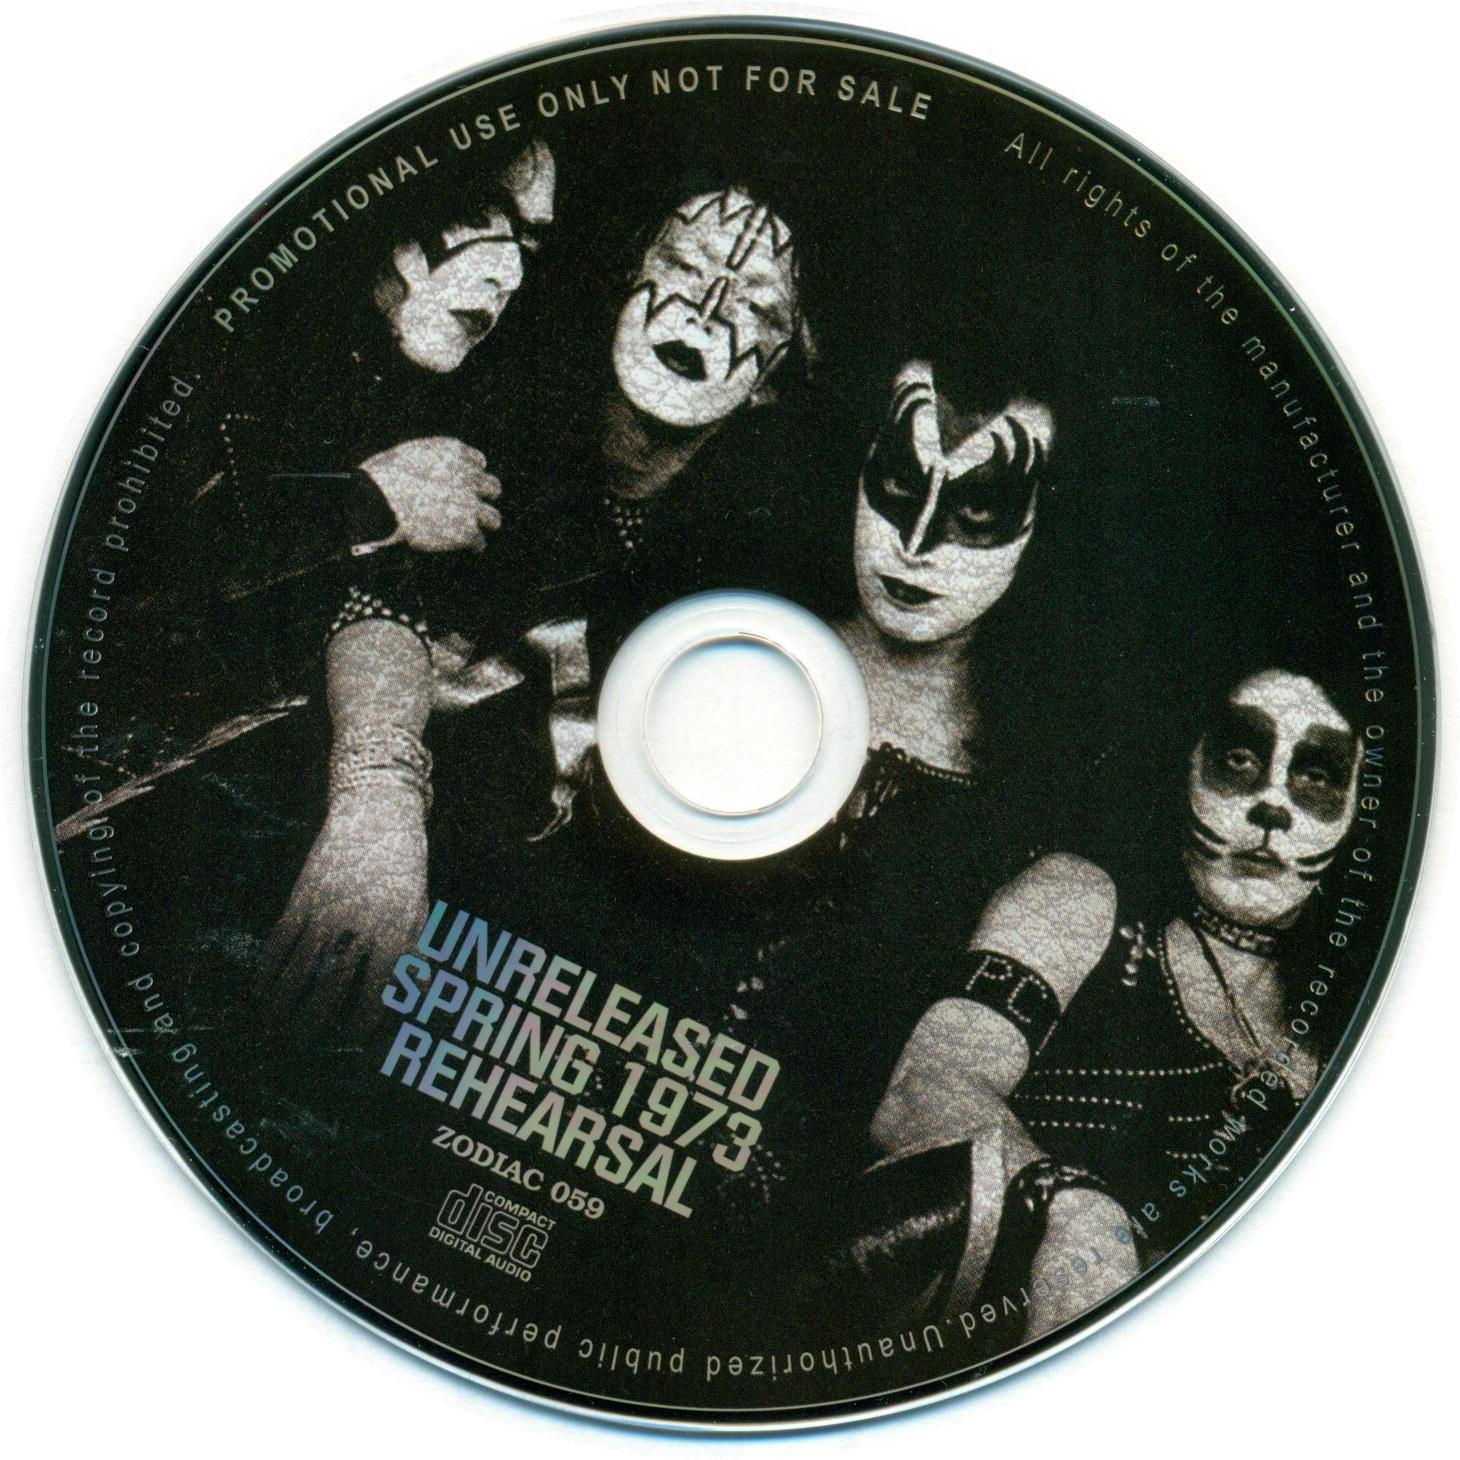 Kiss1973UnreleasedSpringRehearsalLiberatedBootleg.jpg